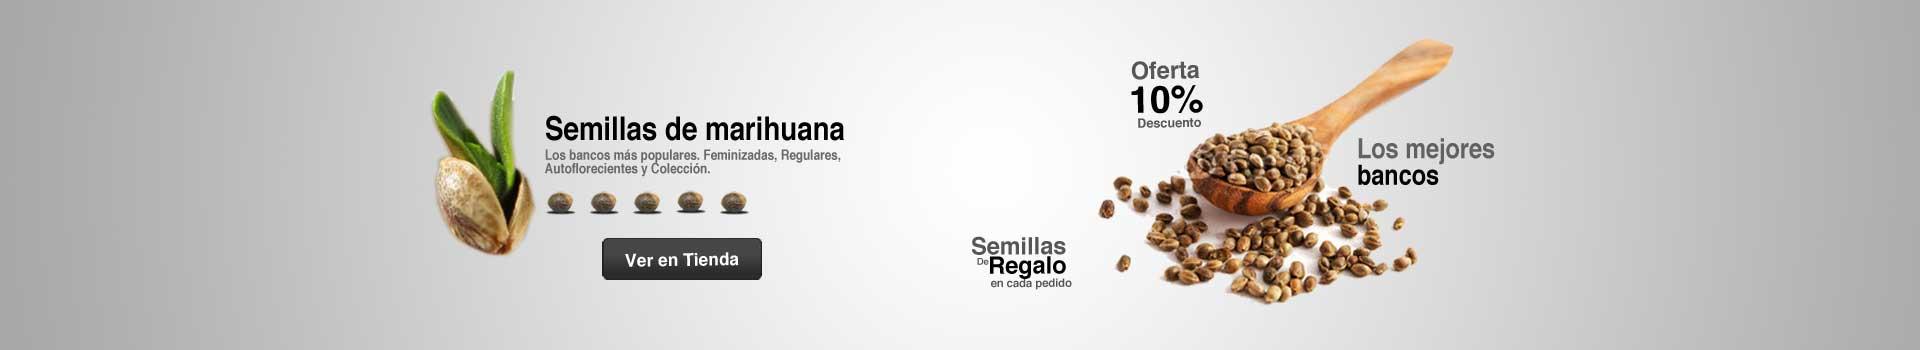 Oferta en semillas de marihuana